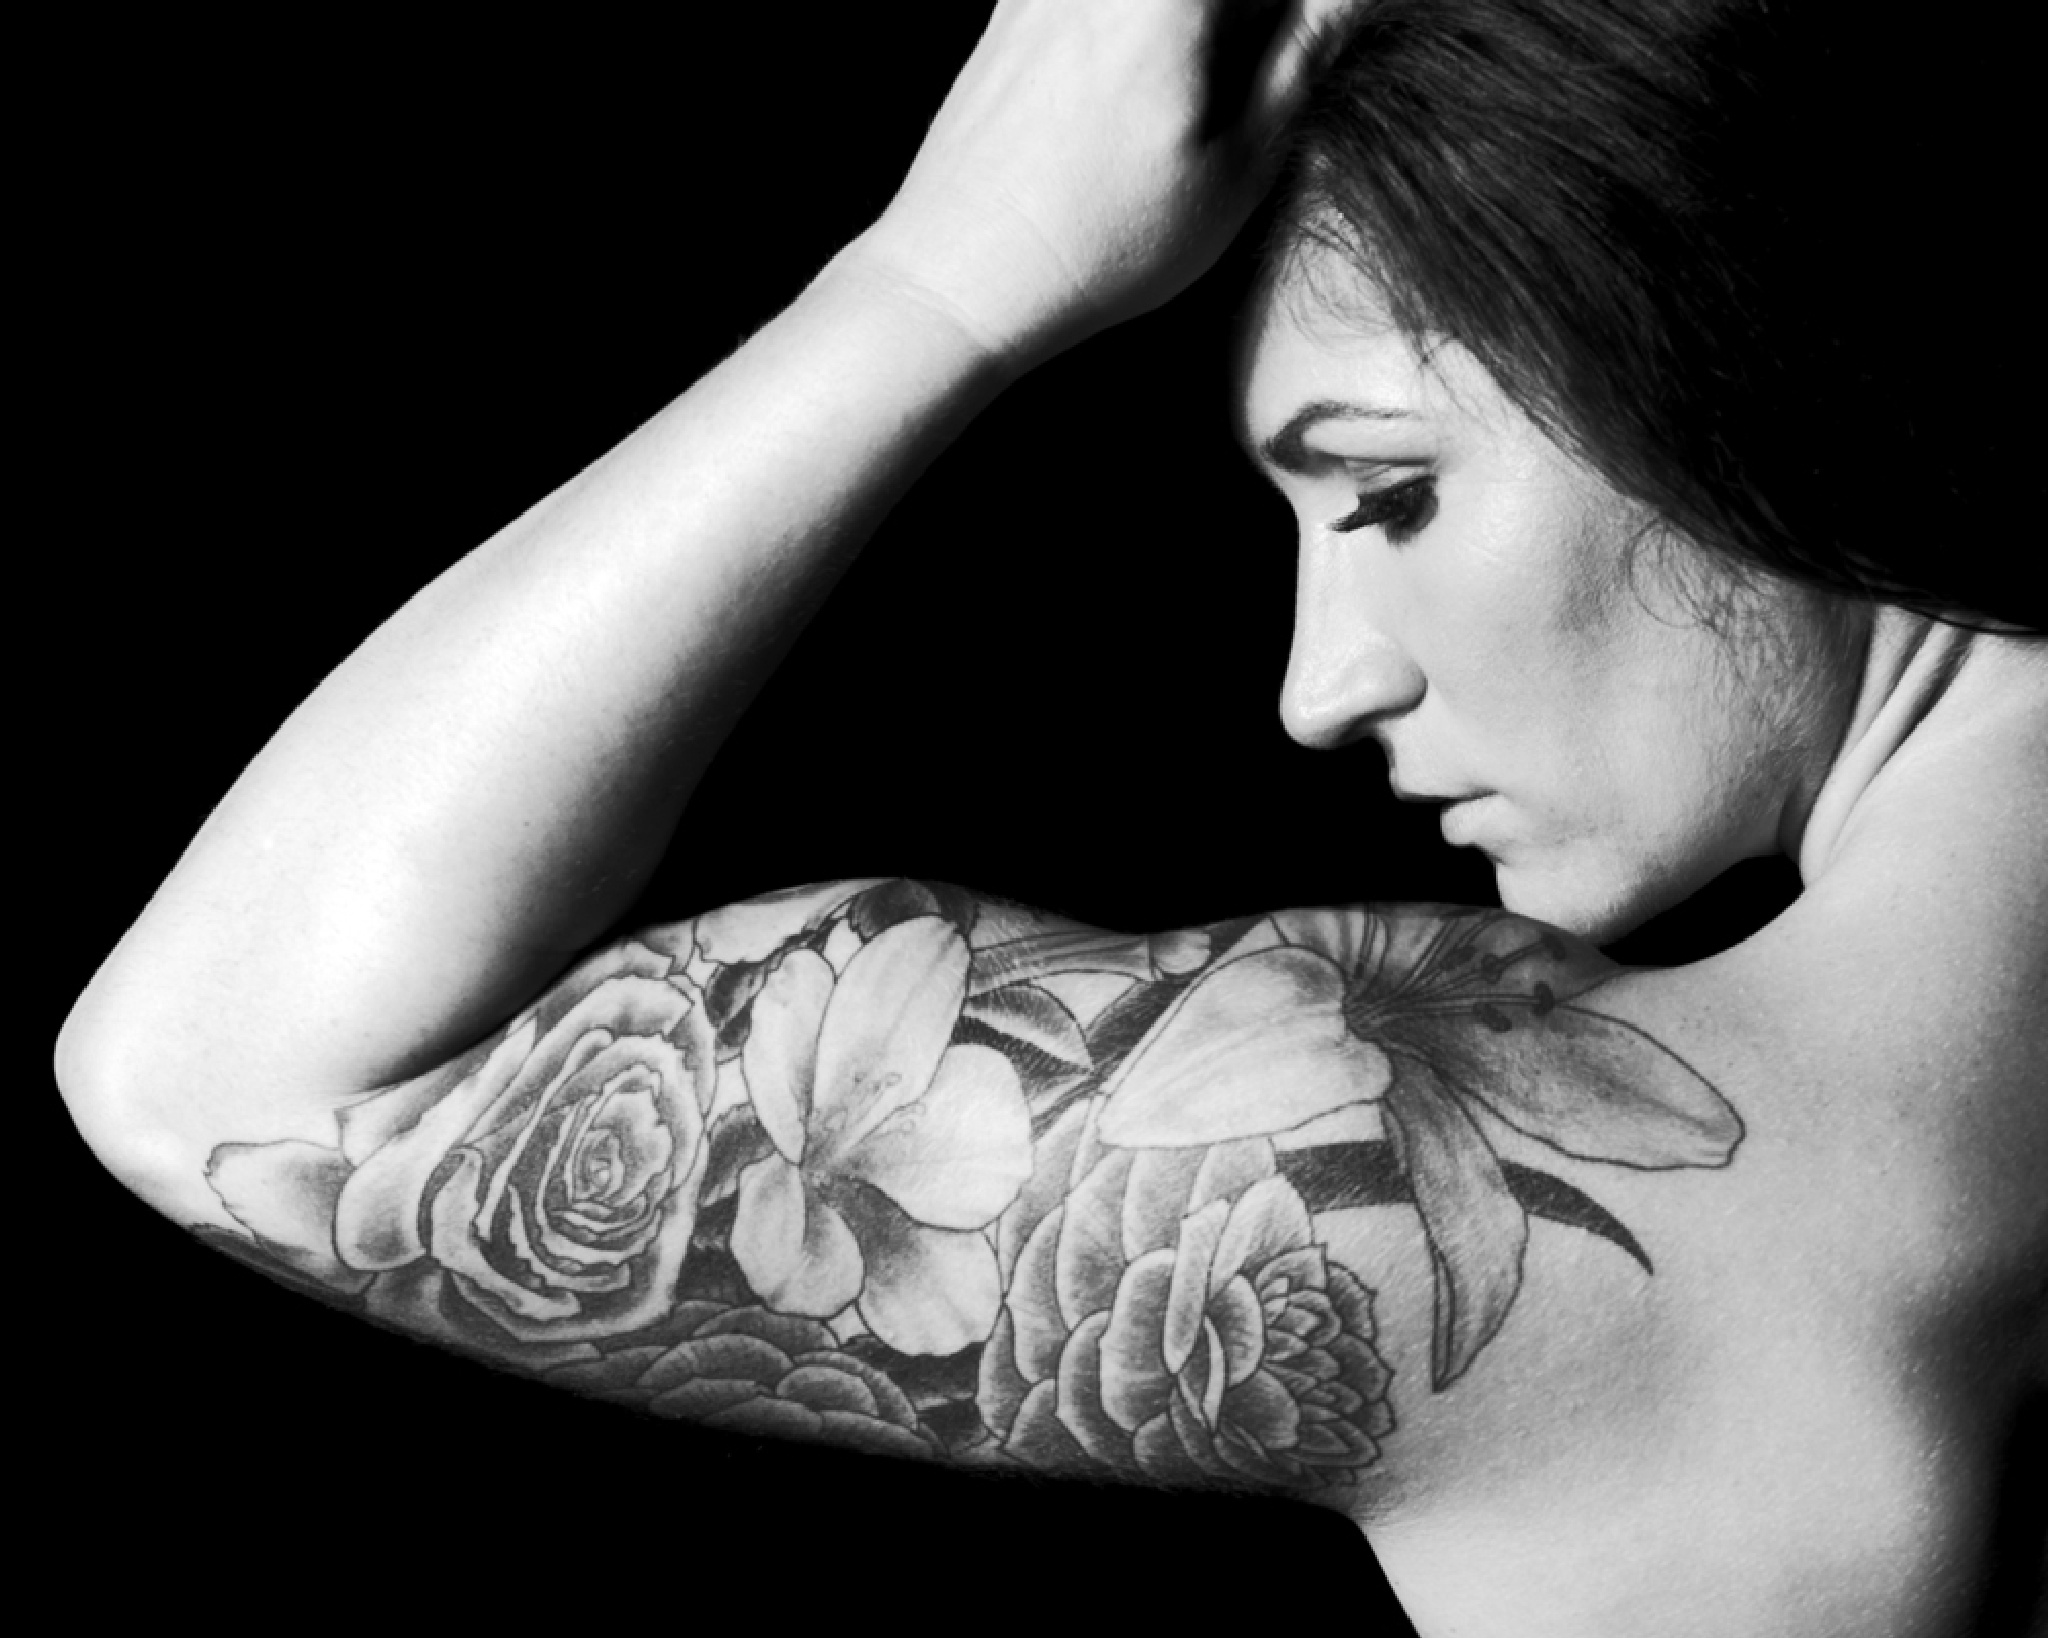 Meagan's Ink by Randalay